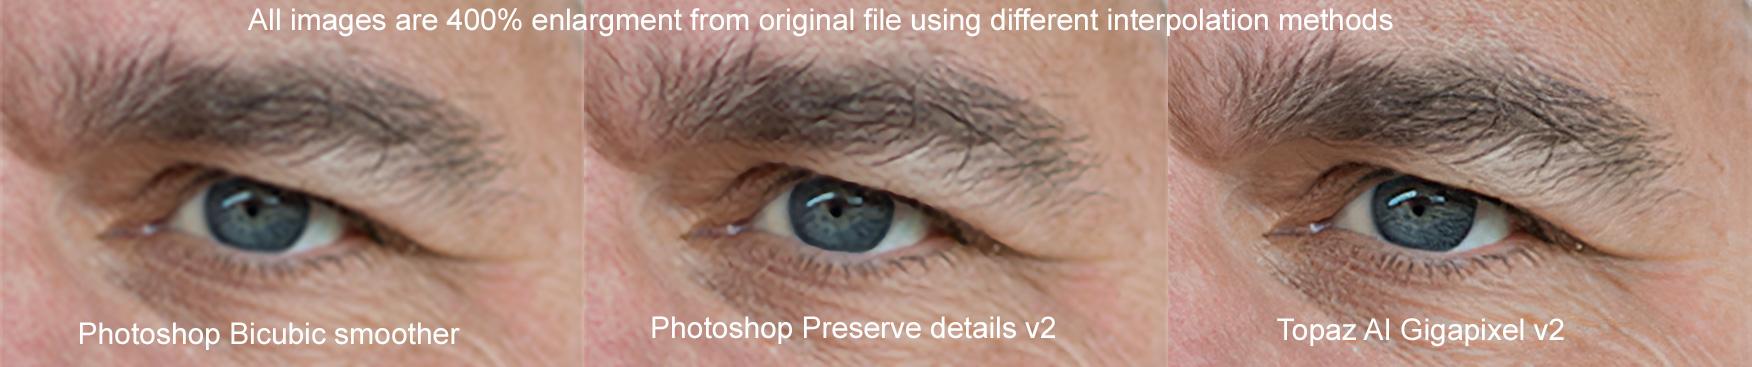 Topaz gigapixel requirements   Topaz A I  Gigapixel v3 0 4 Free